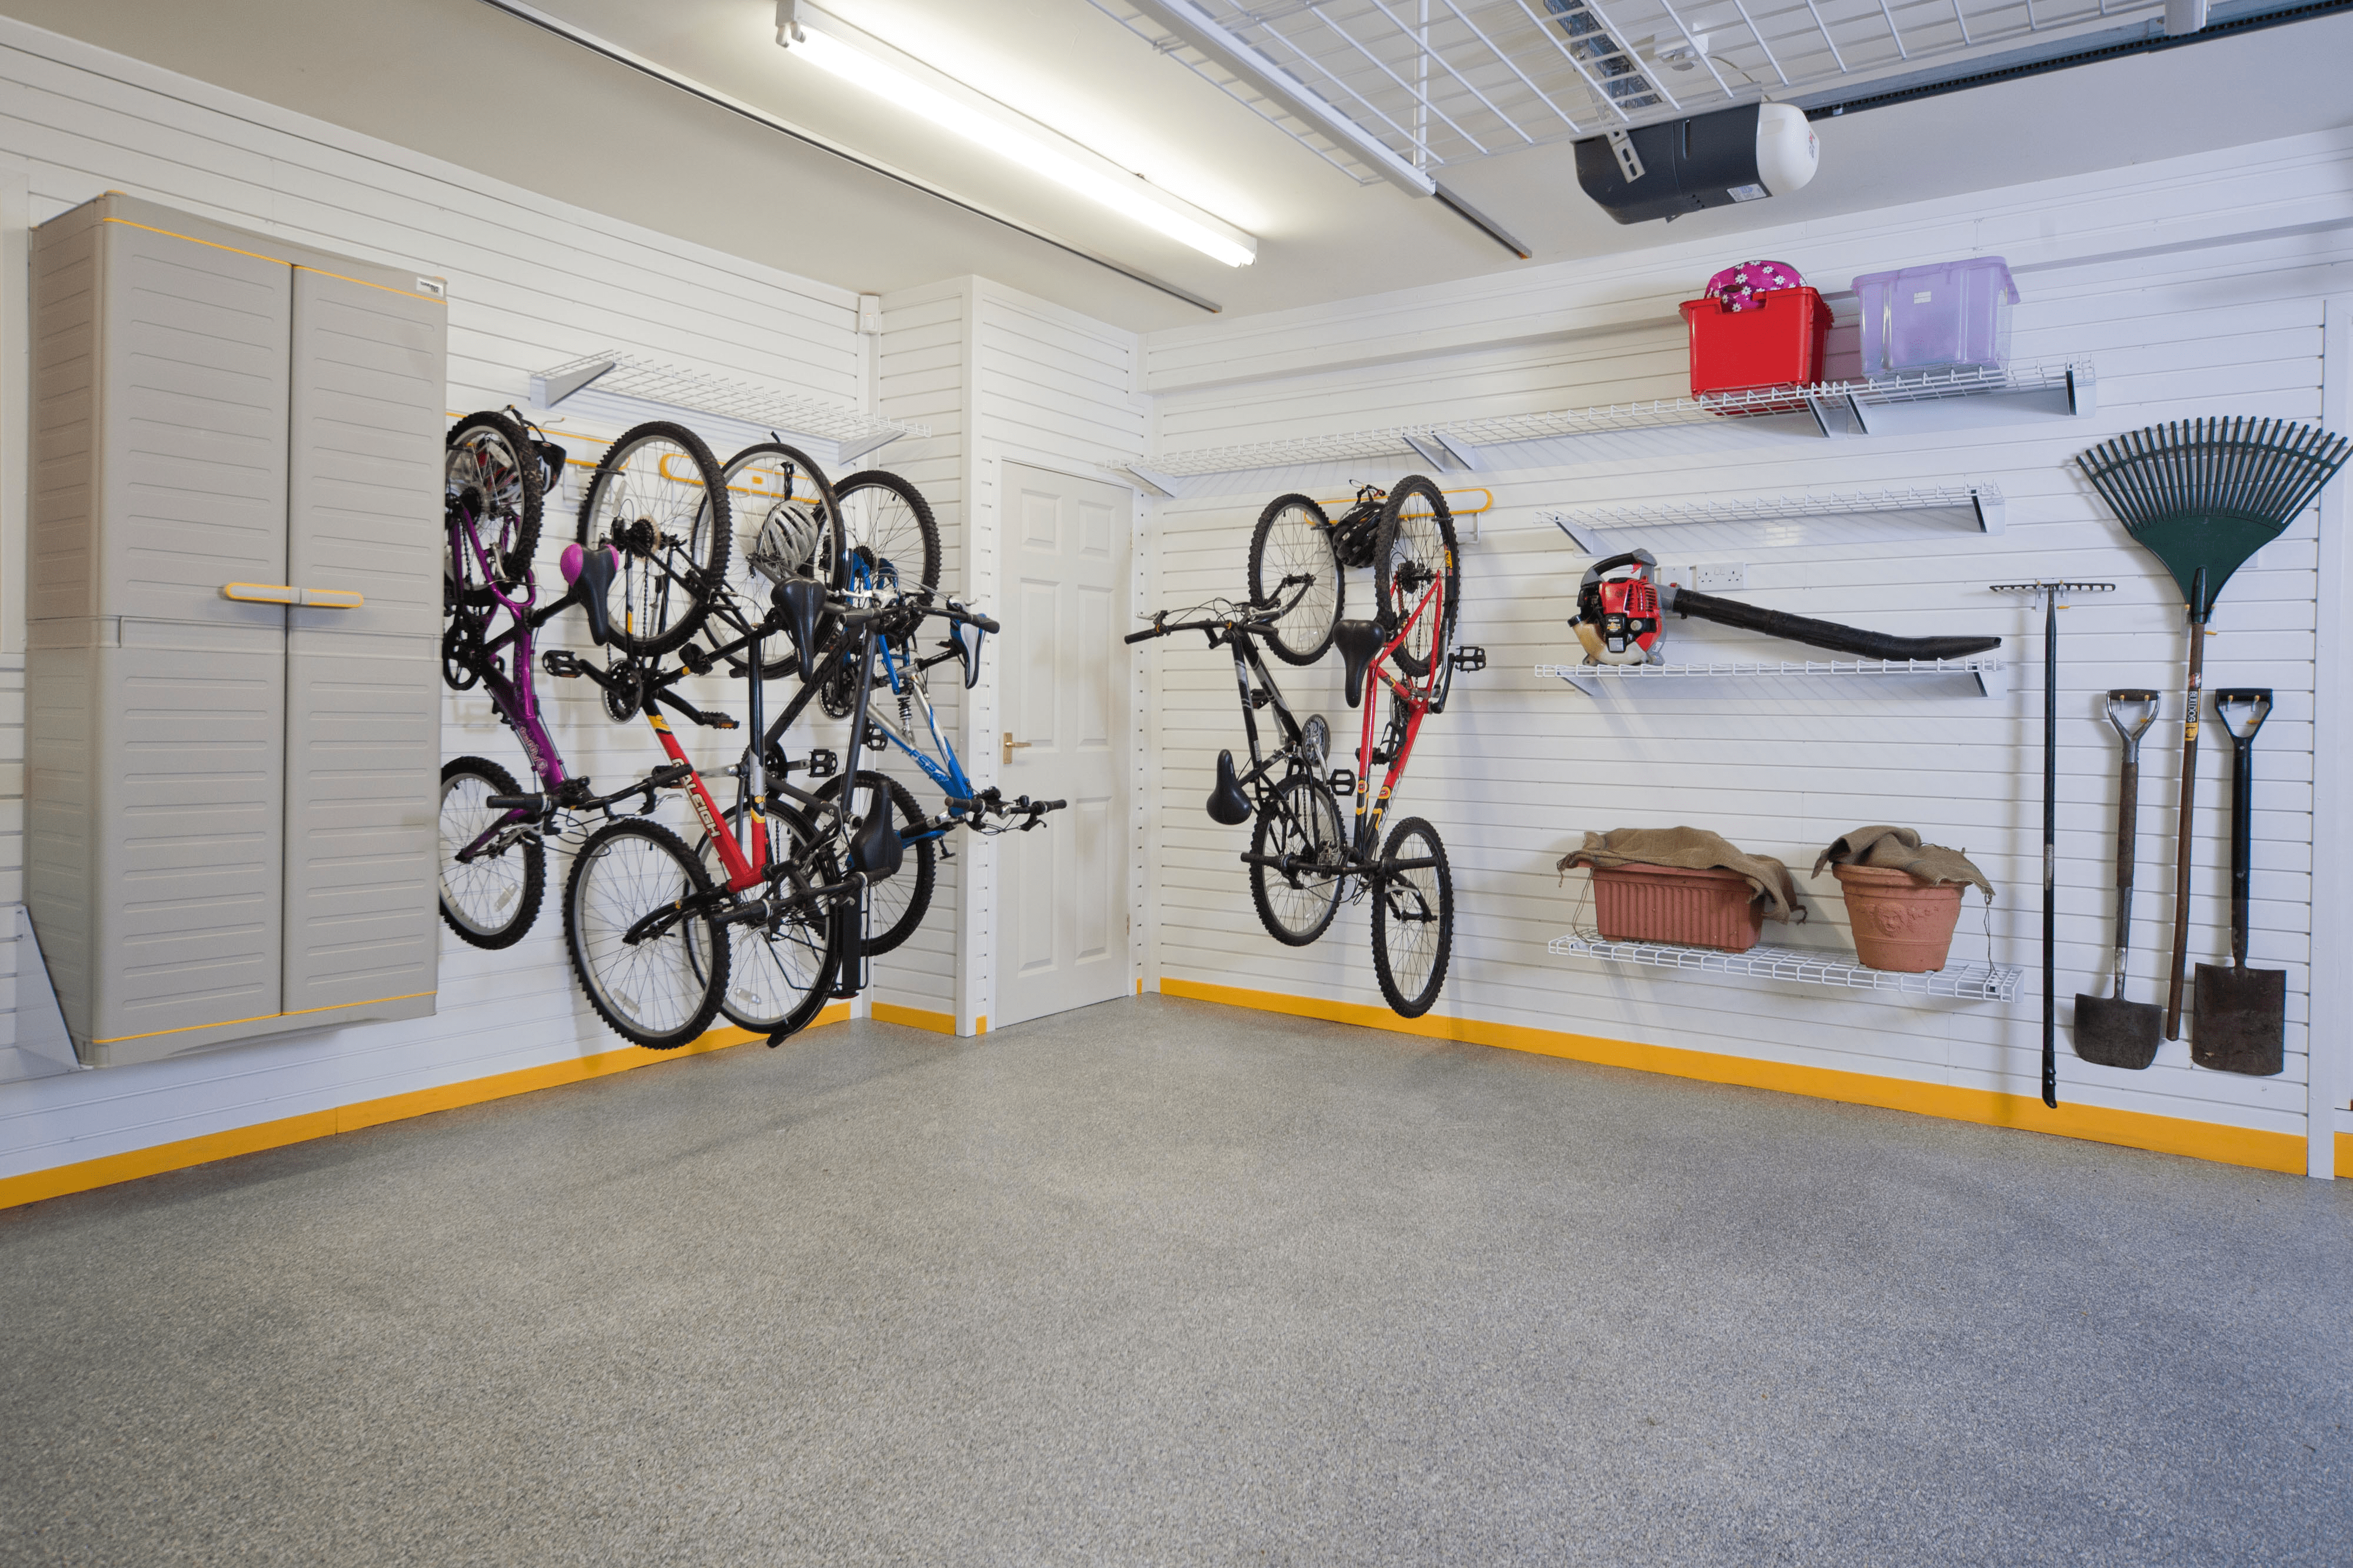 Garage wall decorating ideas